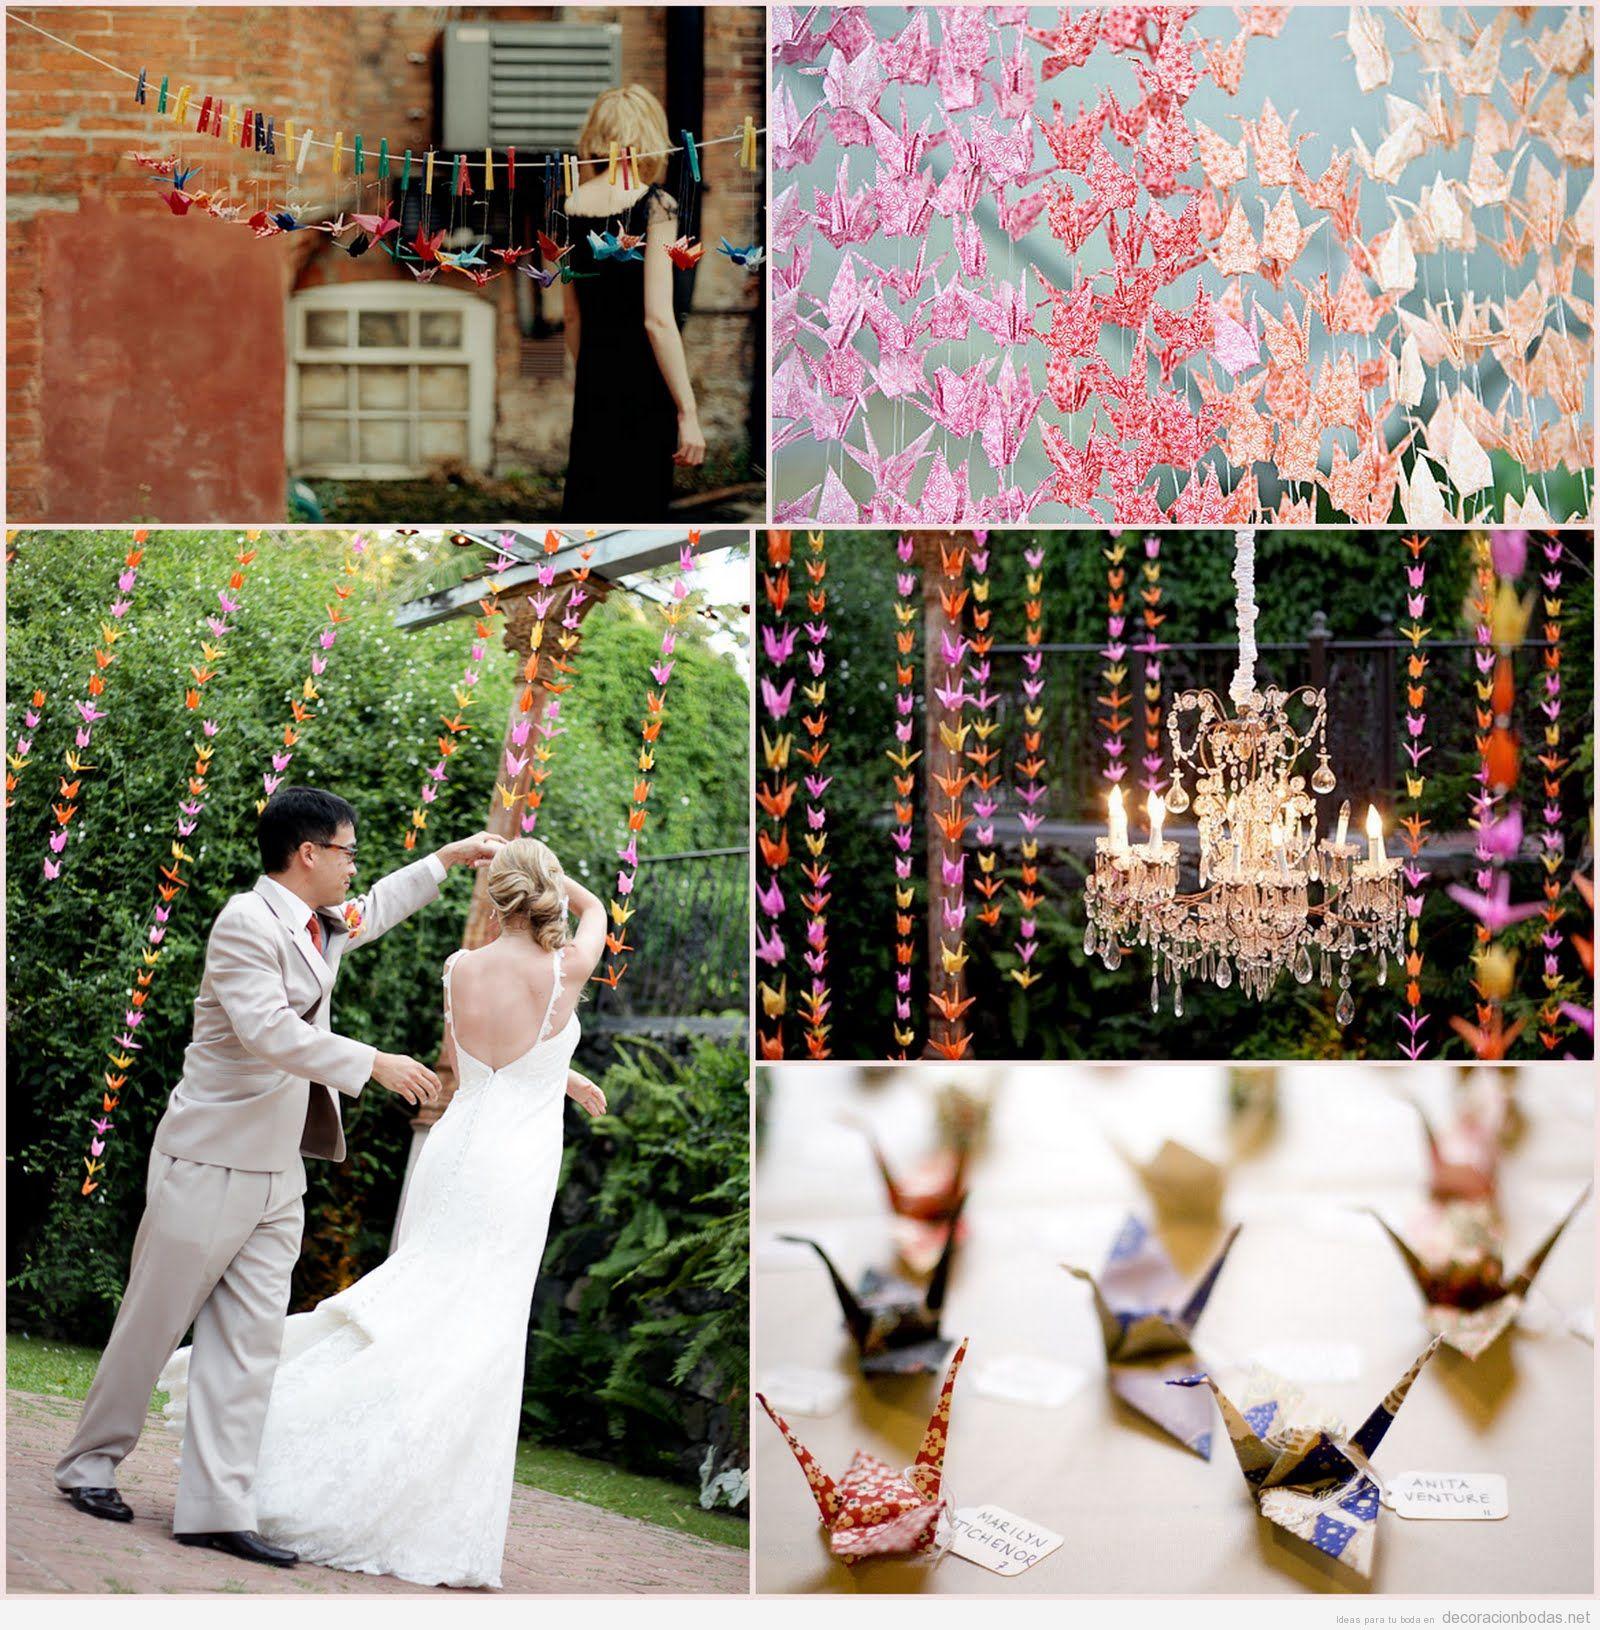 Papiroflexia archivos decoraci n bodas for Decoracion de bodas originales